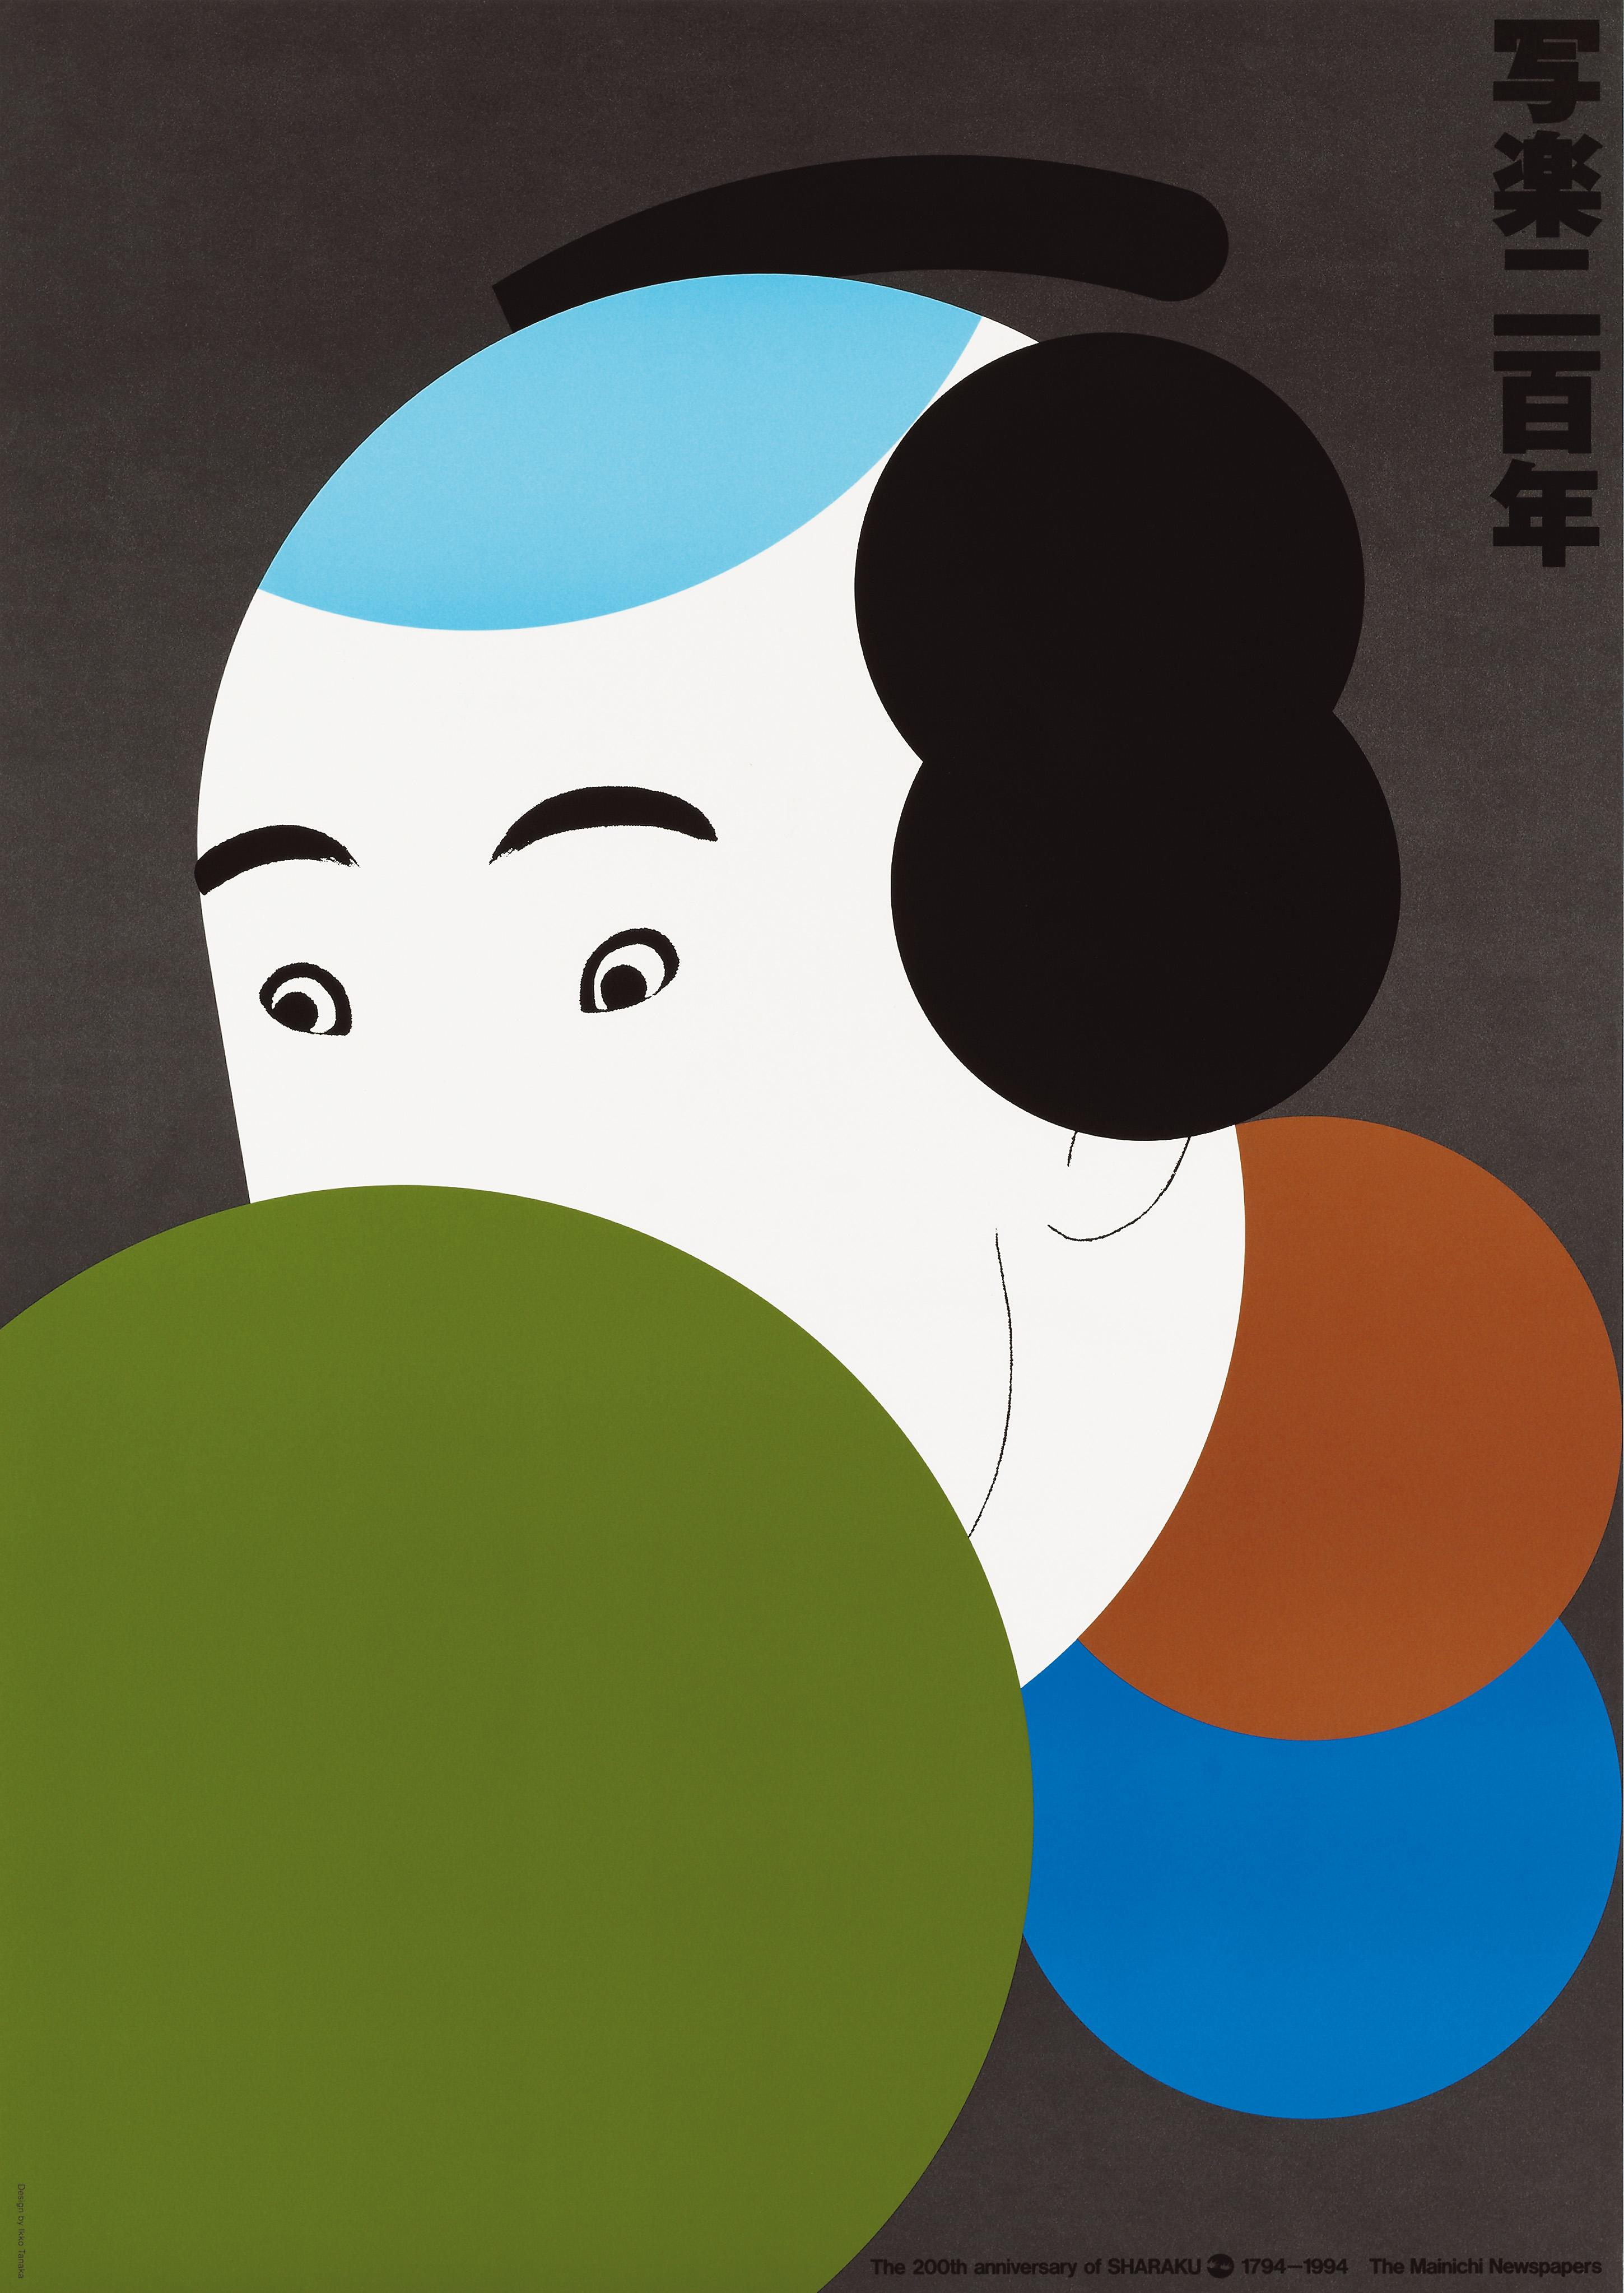 Ikko Tanaka AI project - image 1 - student project